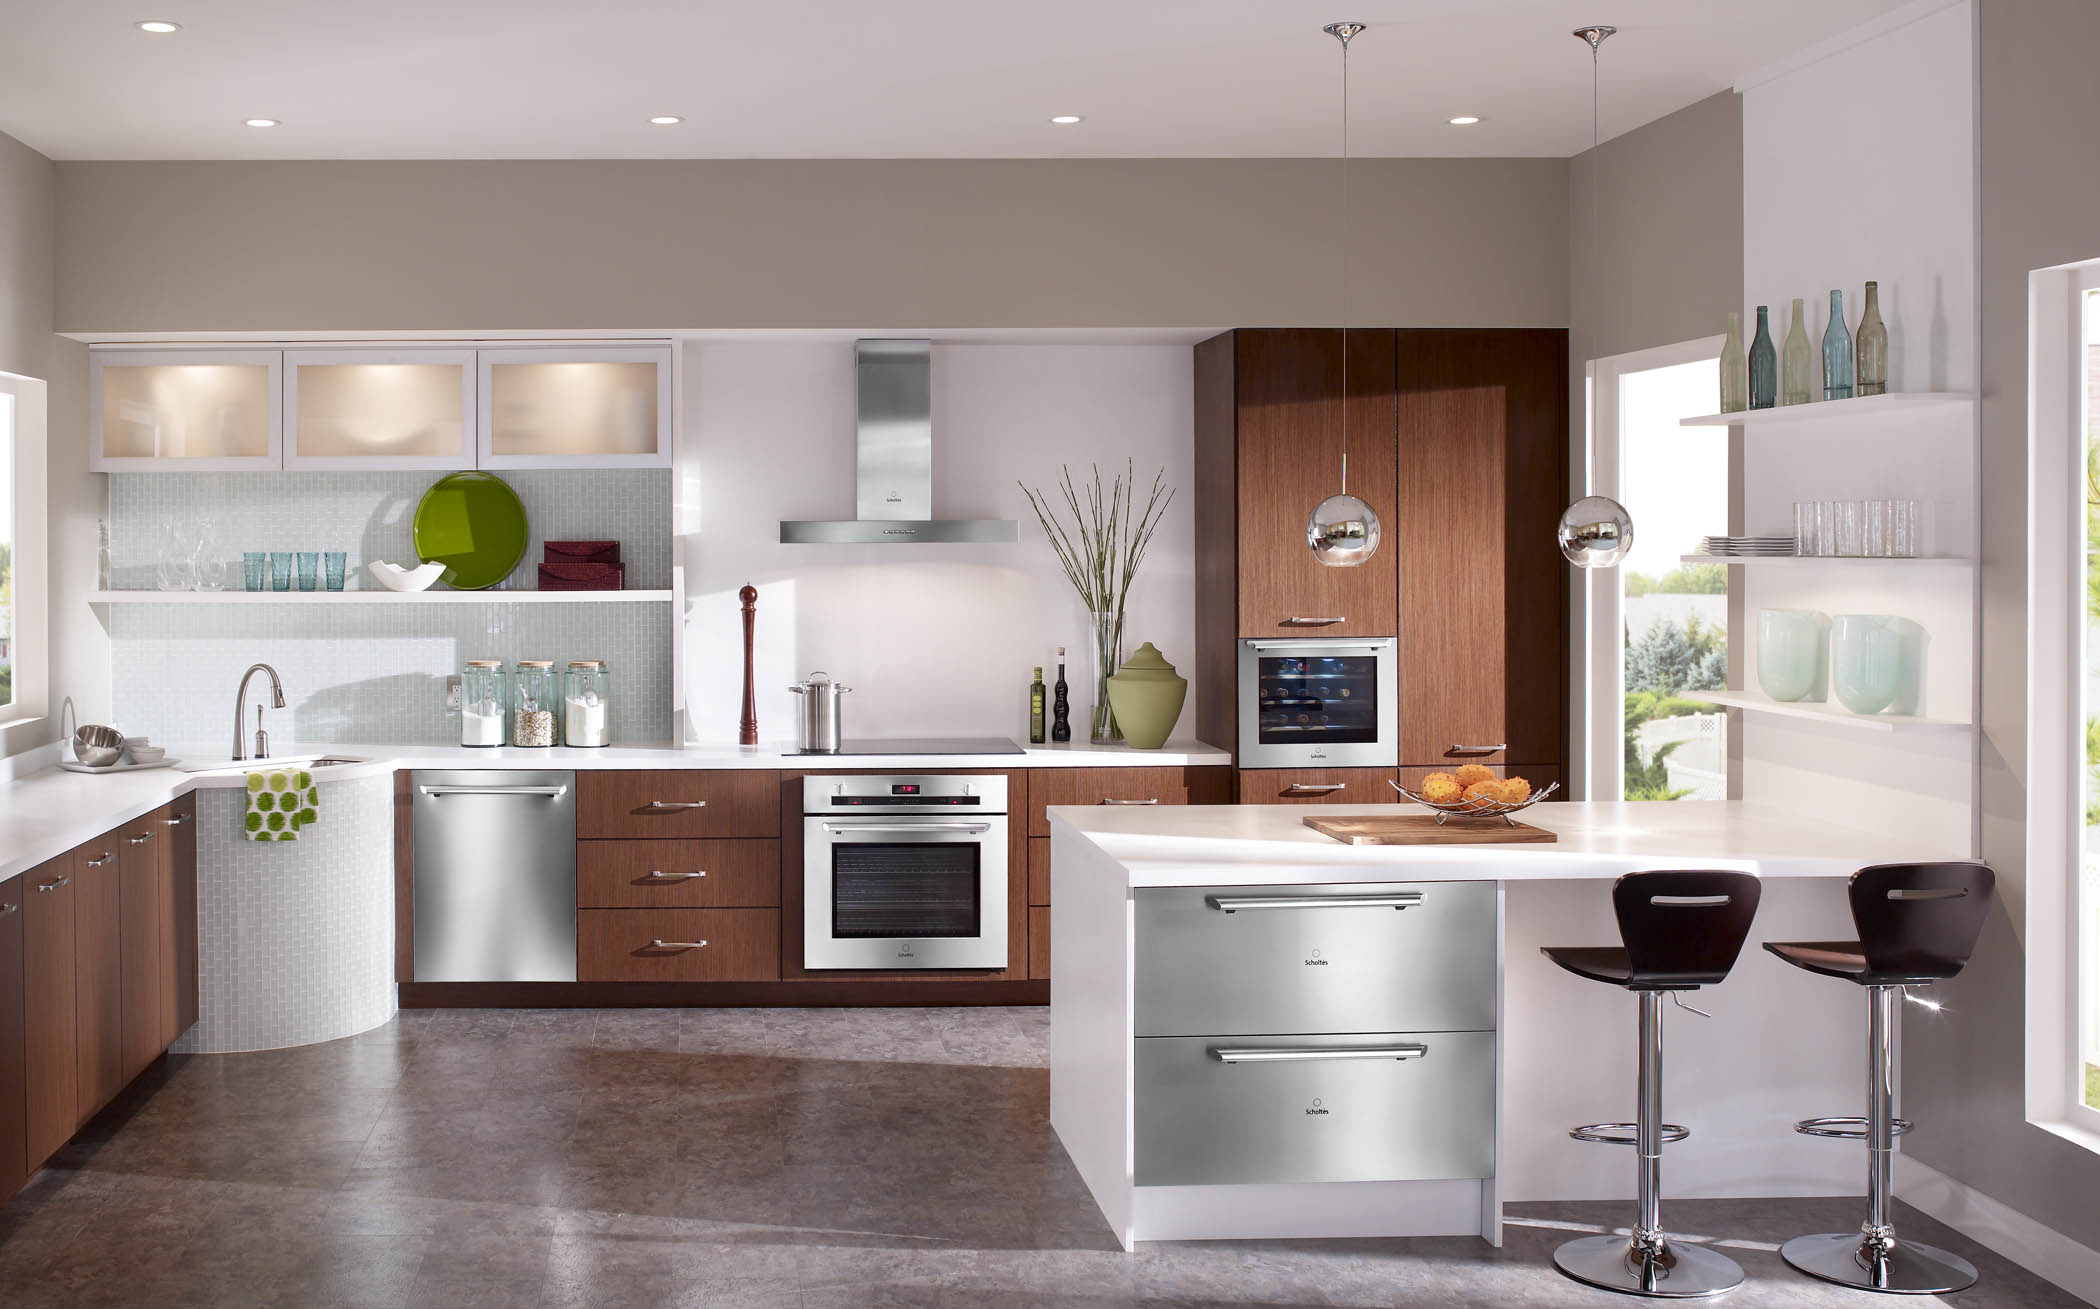 Kitchen Appliances Online Kitchen Appliances Store Designsbygailus